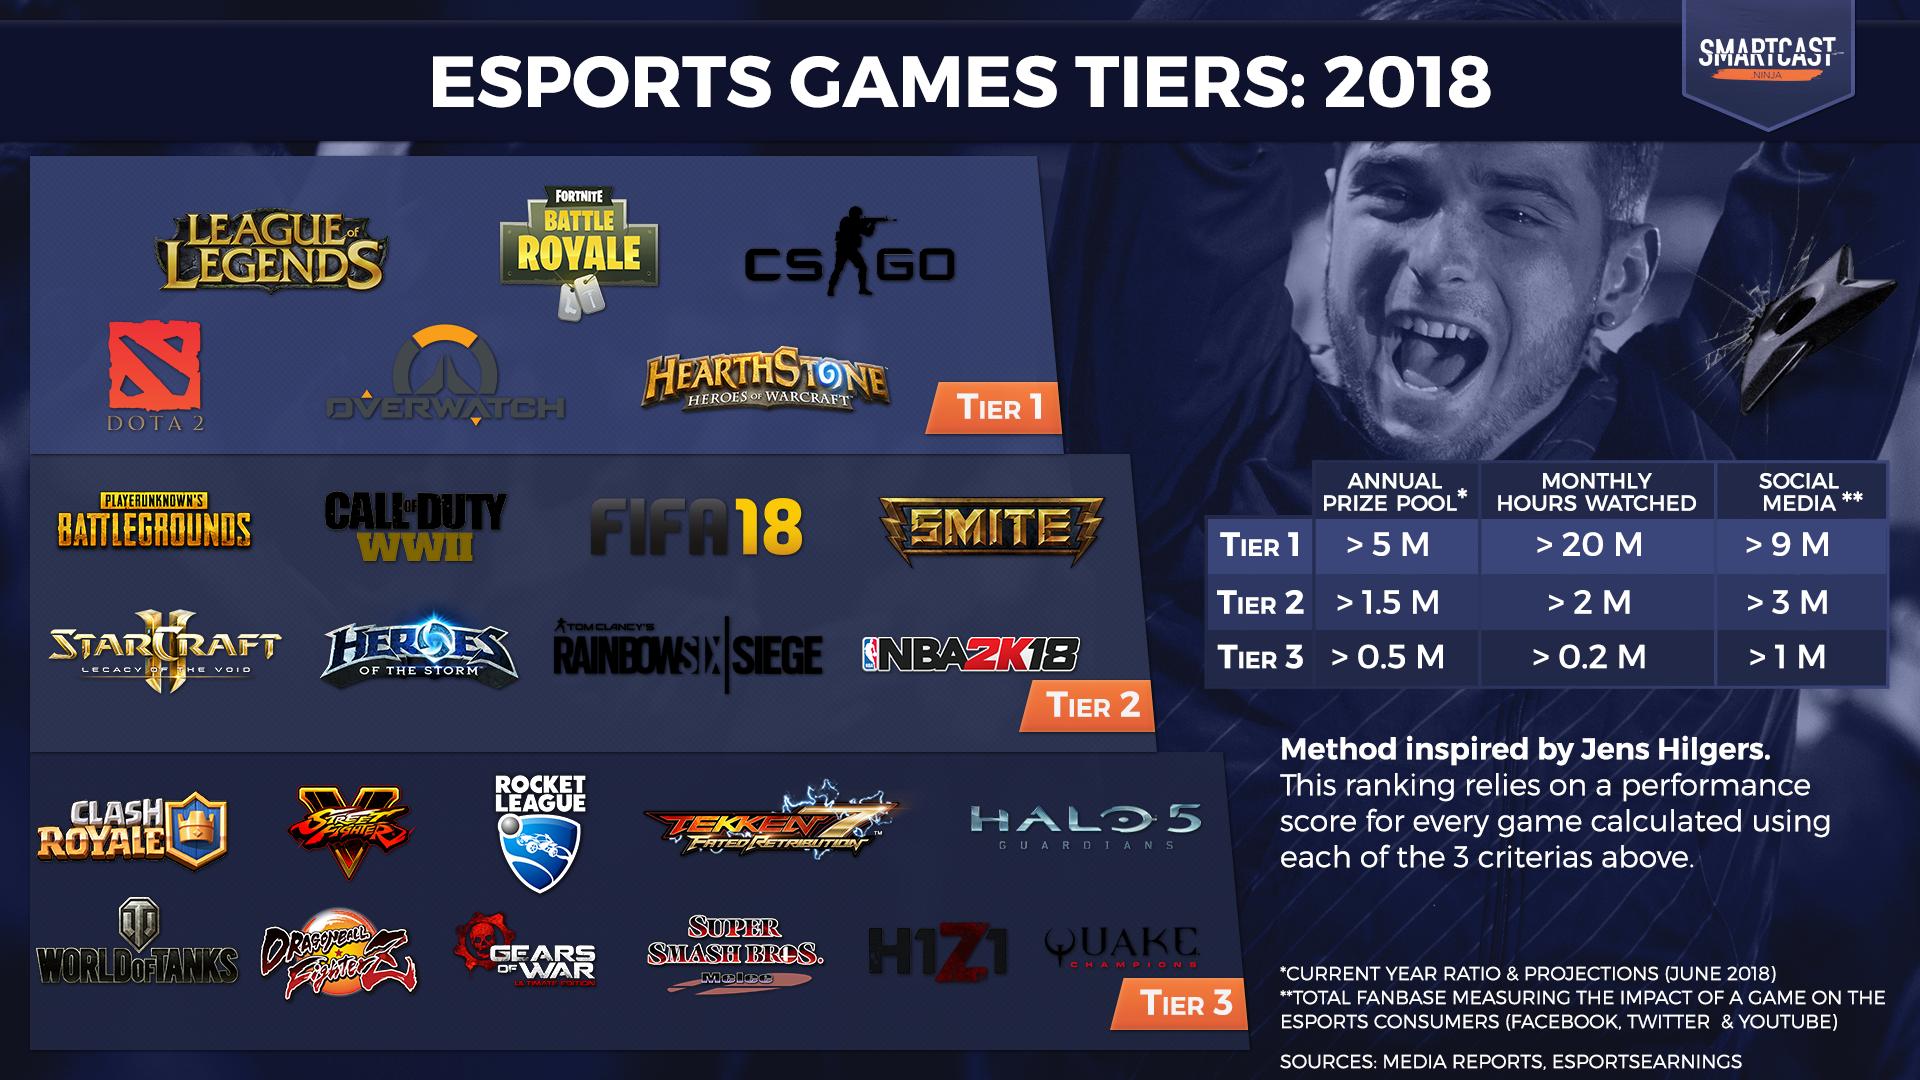 e-sportsゲームタイトルの影響力と可能性を示すリスト「e-sports Games Tier 2018」が公開。バトルロイヤルジャンルの発展が凄まじい